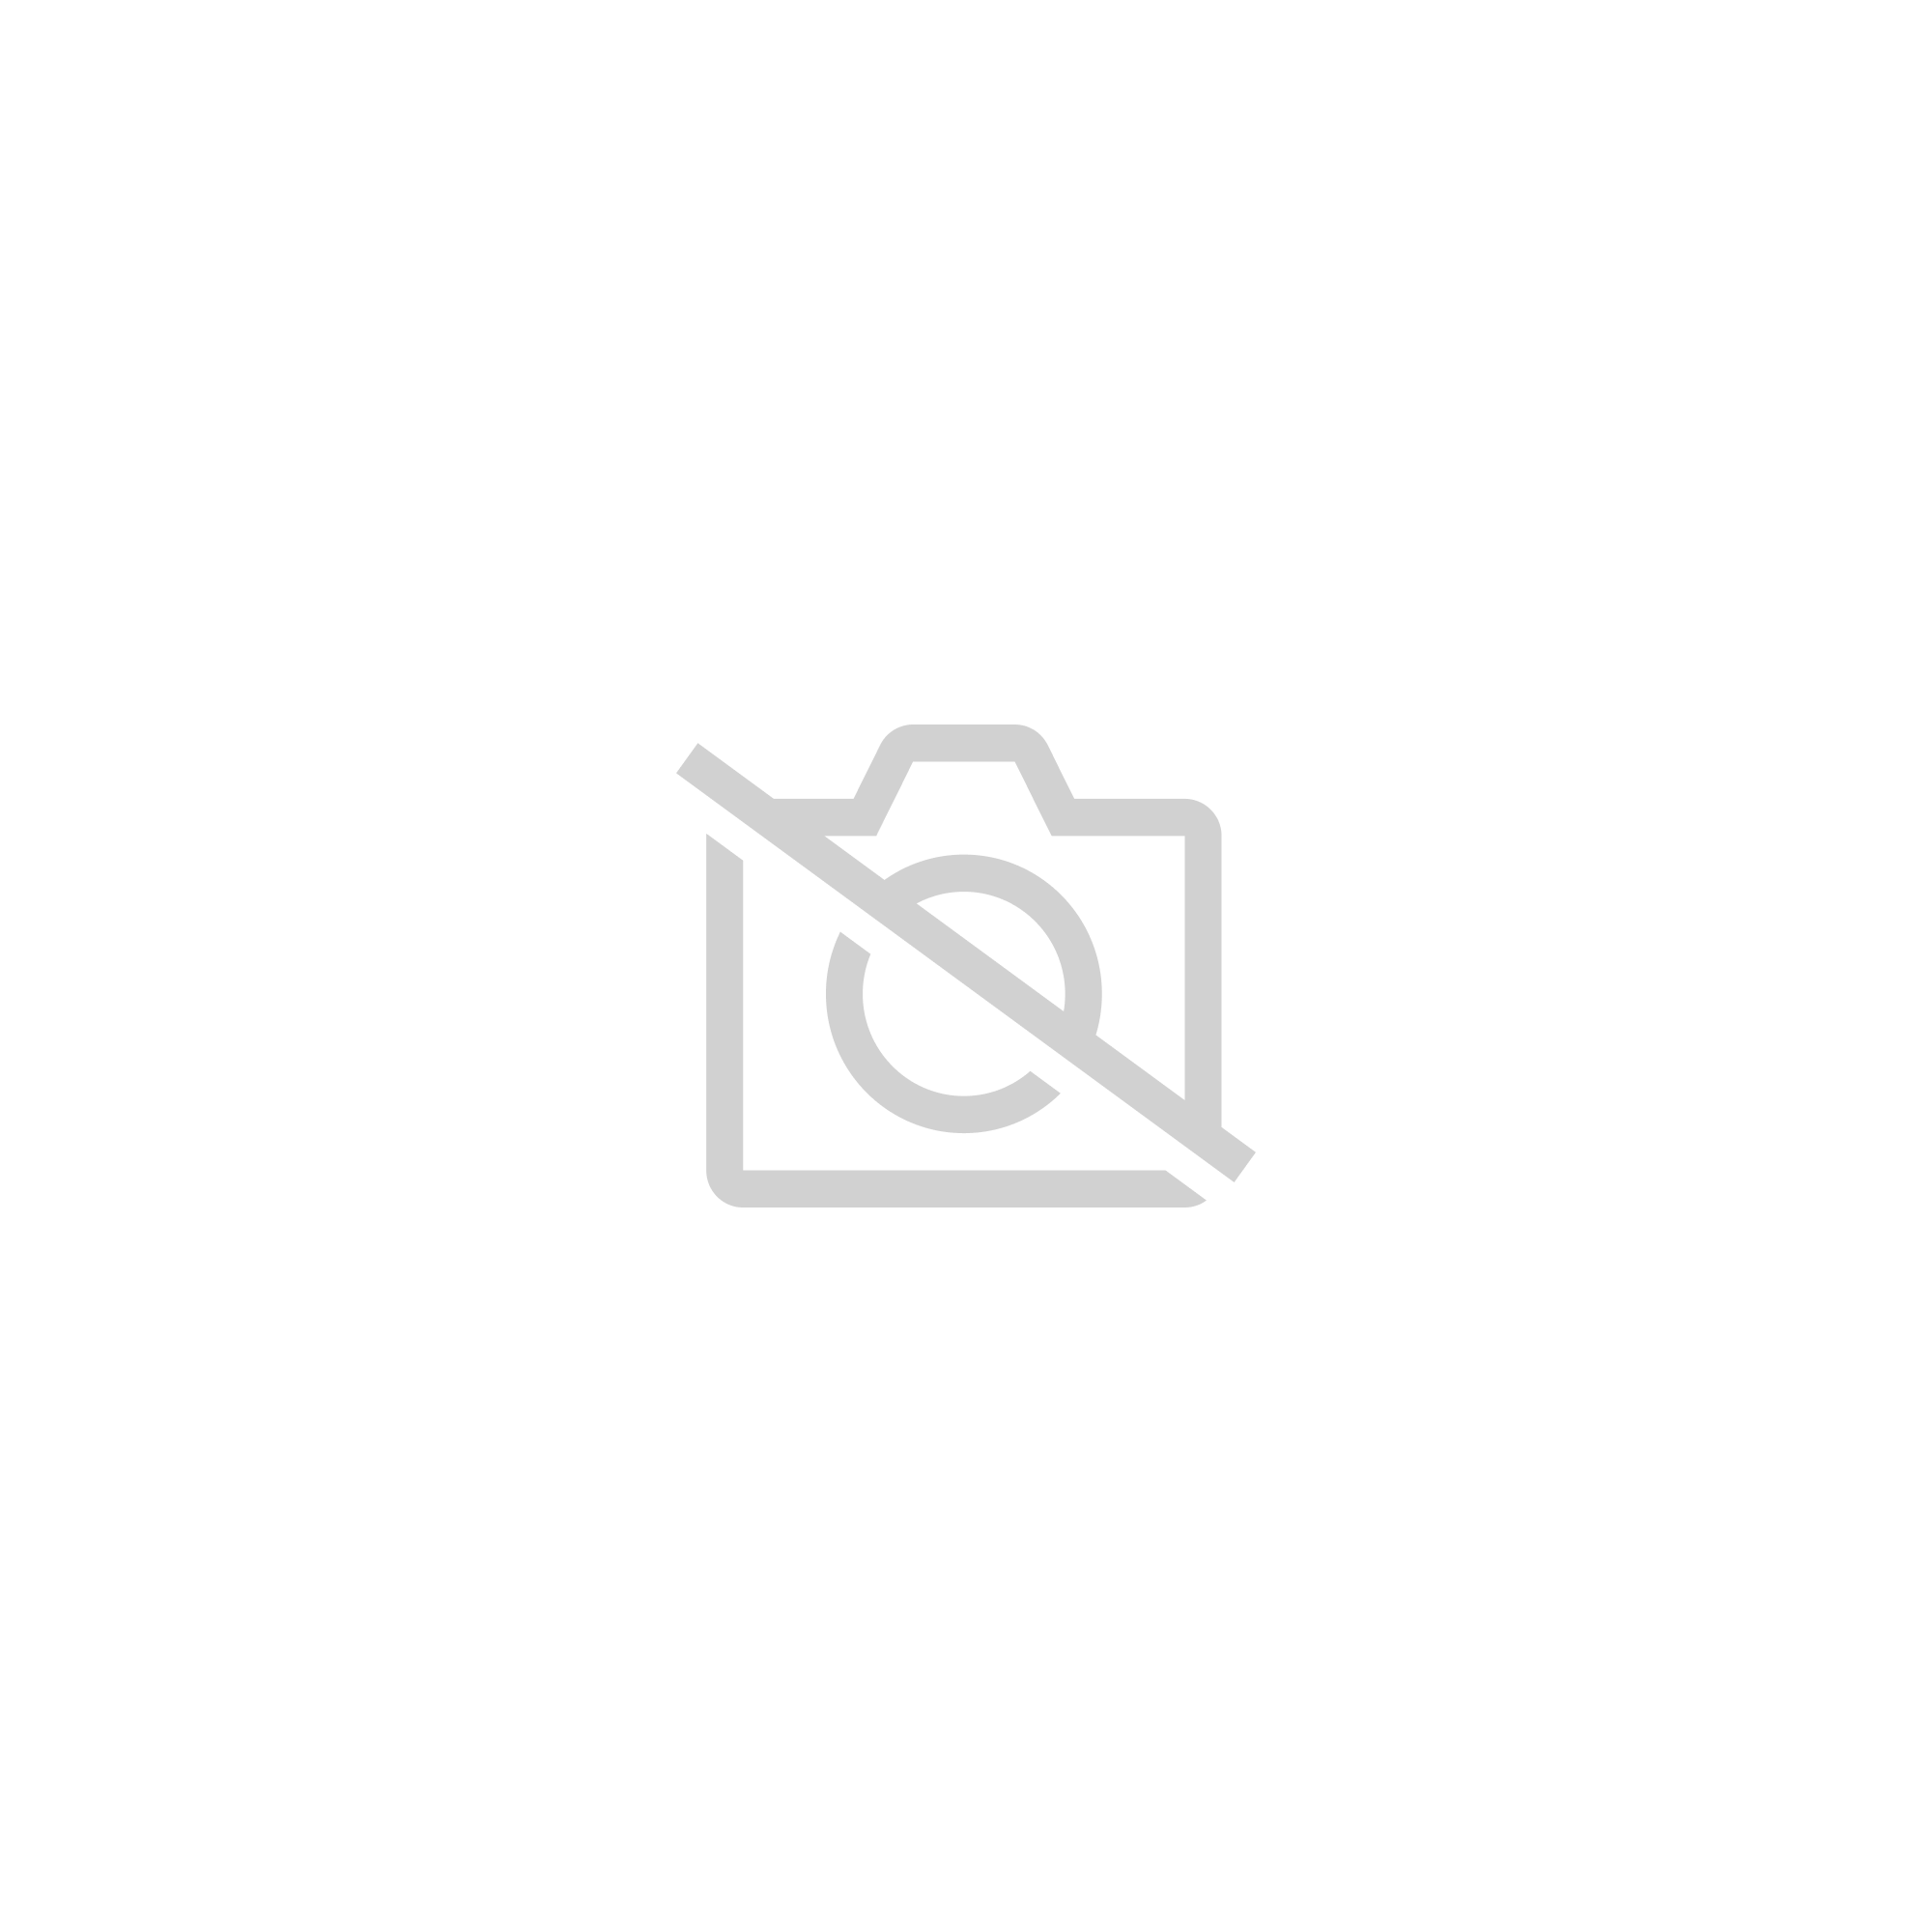 BRACELET BOIS MARRON BIJOUX ARTISANAT ETHNIQUE ELASTIQUE NACRE COQUILLAGE